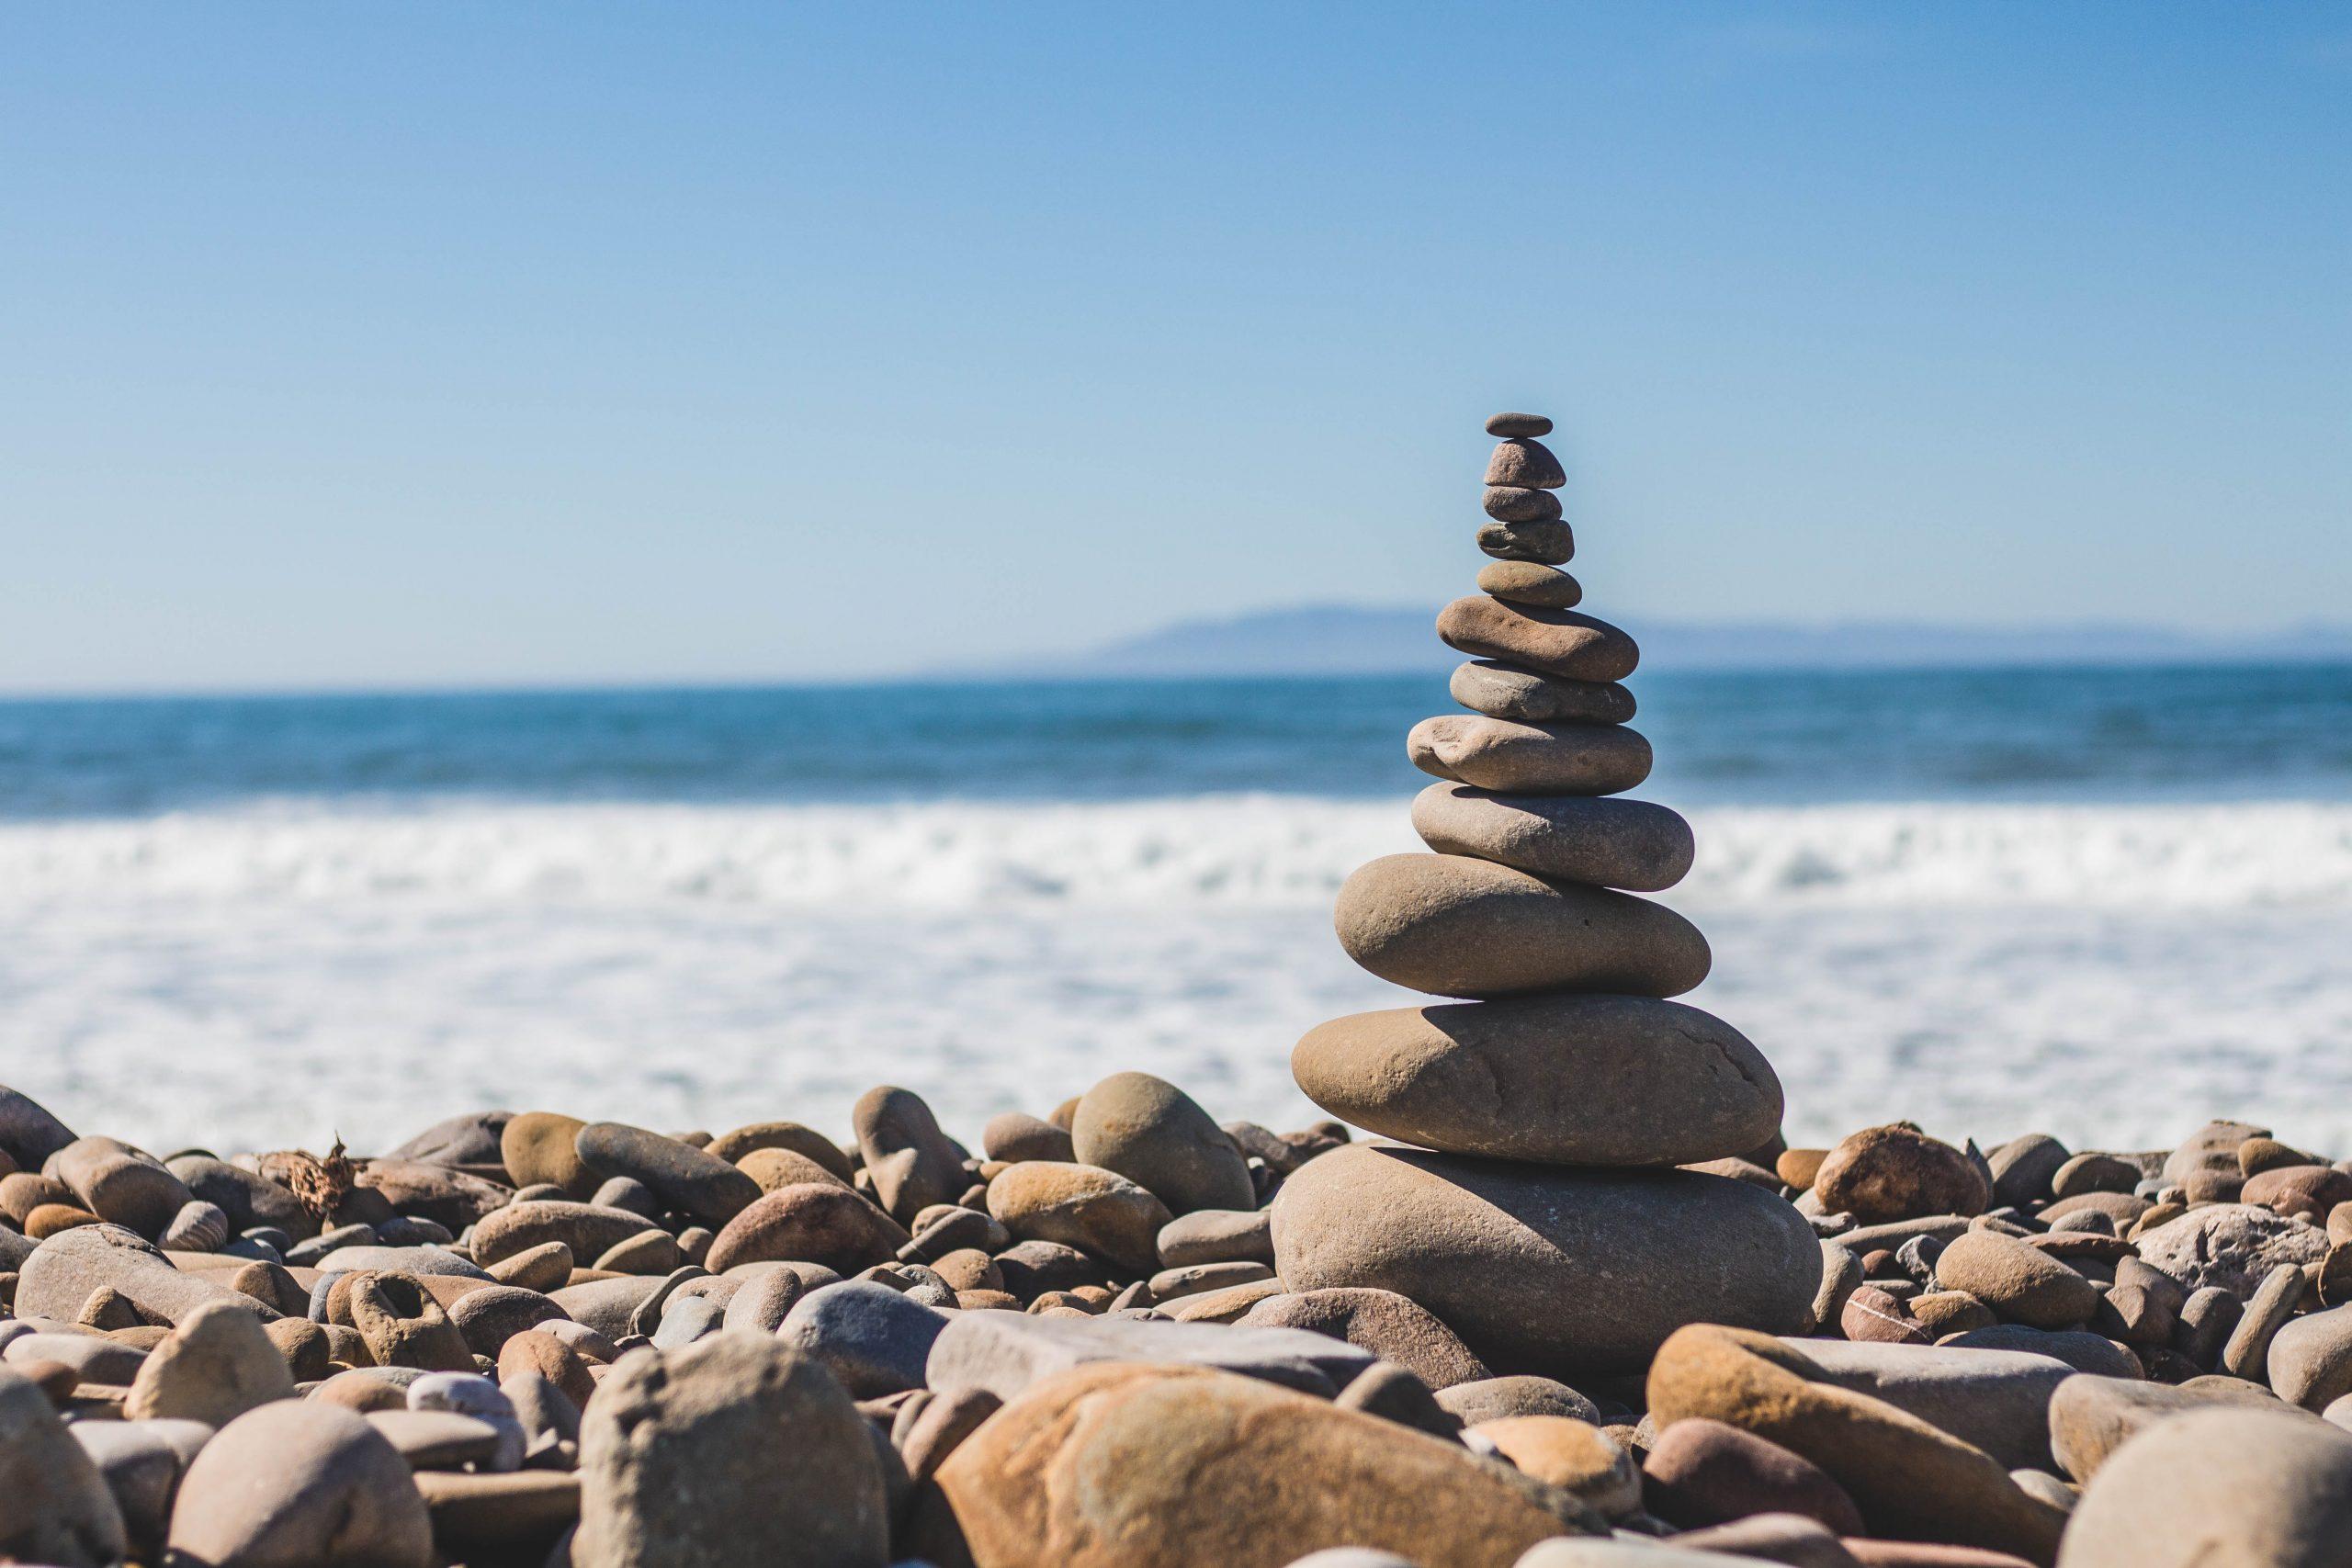 balanced peaceful zen rocks